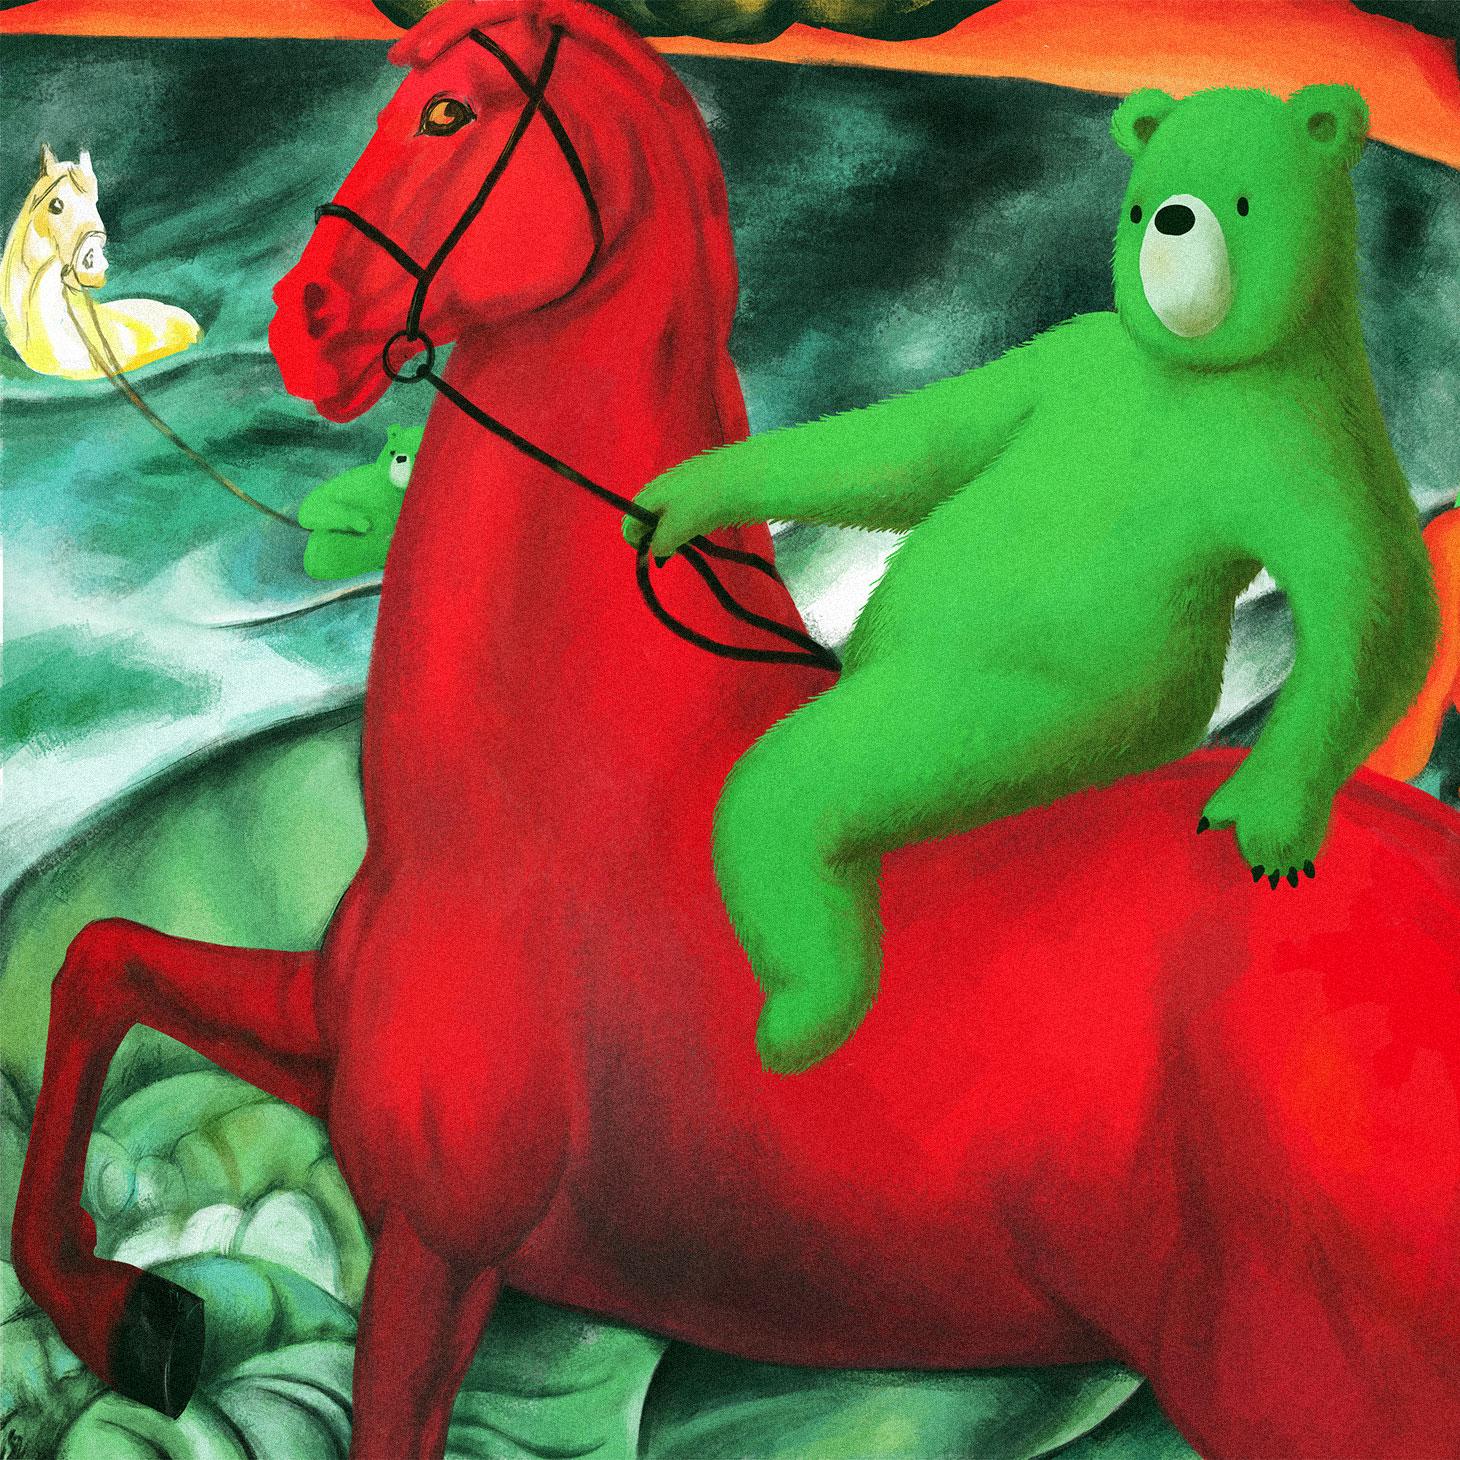 Kuzma Petrov-Vodkin. El baño del caballo rojo